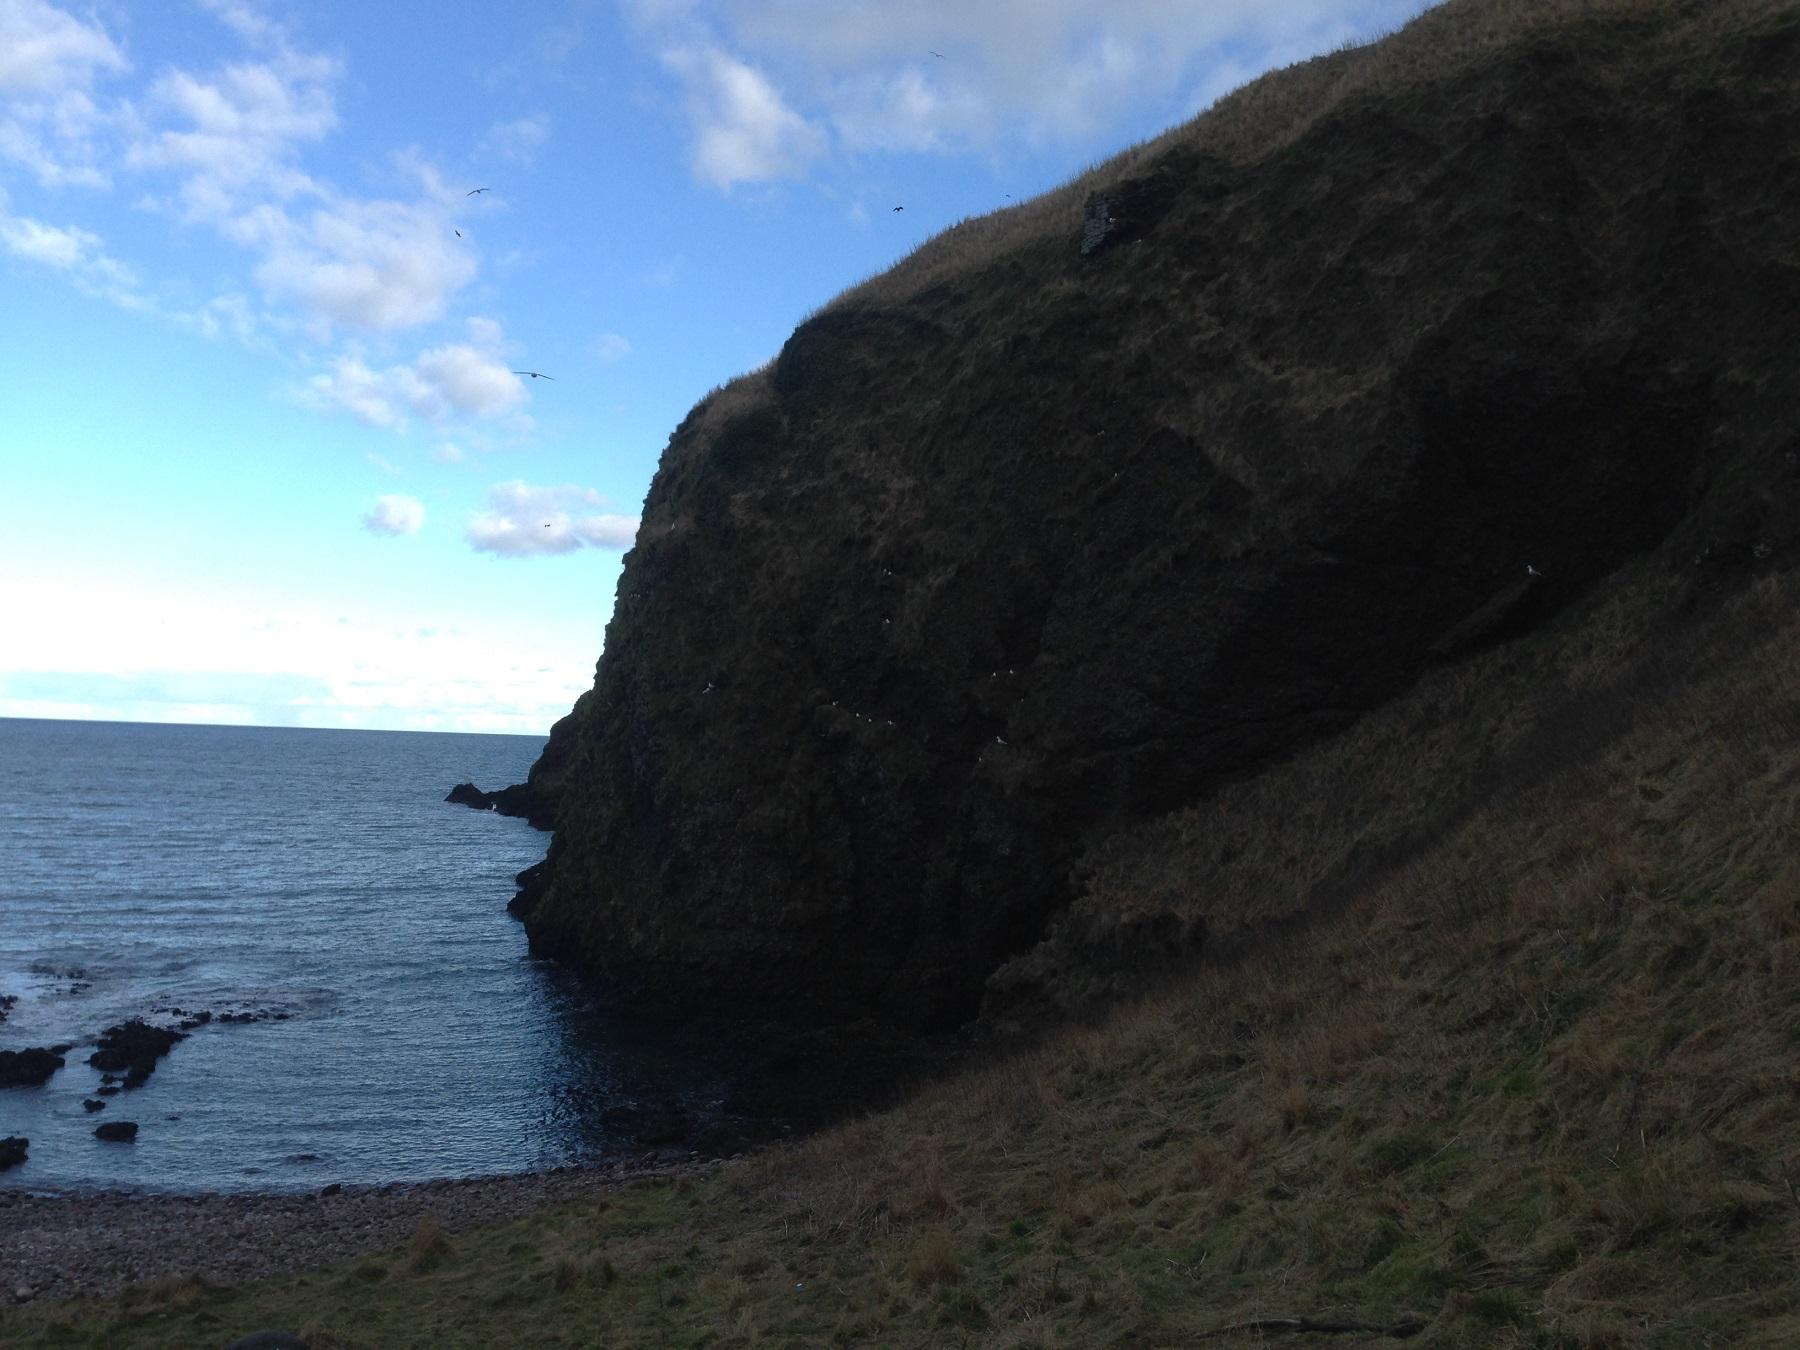 cliffs from below